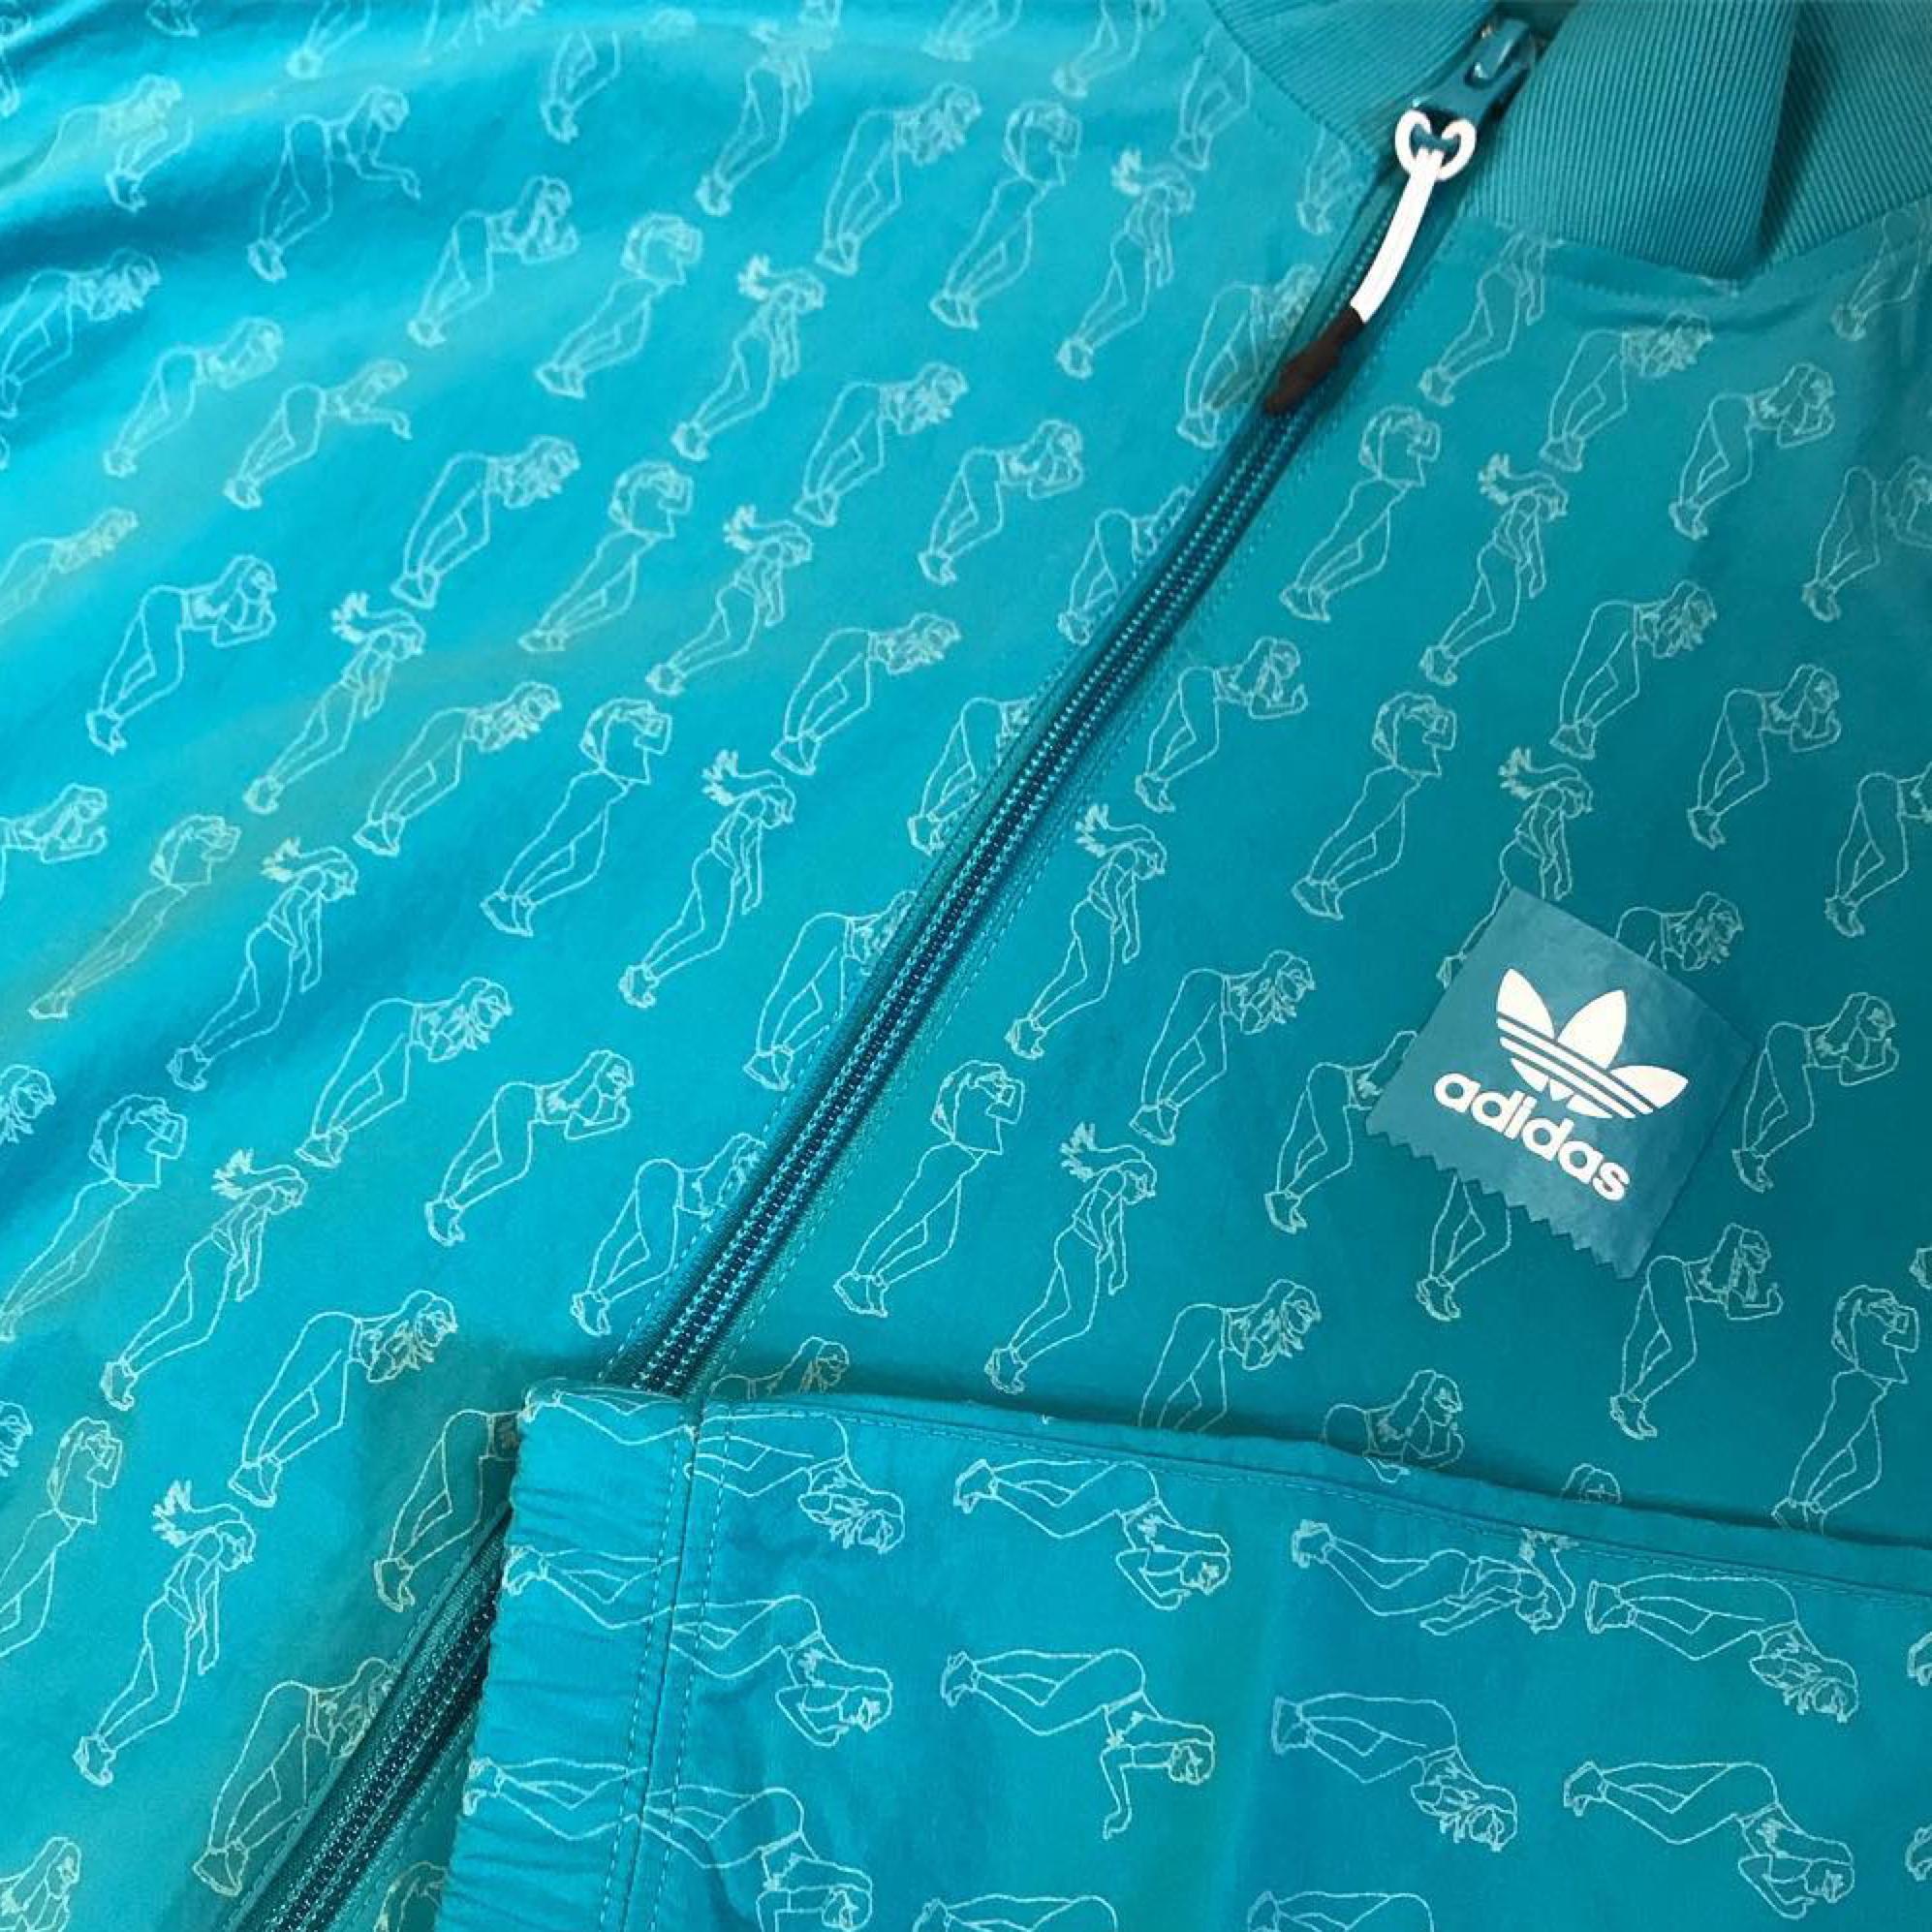 Robin Clare x Adidas Jacket